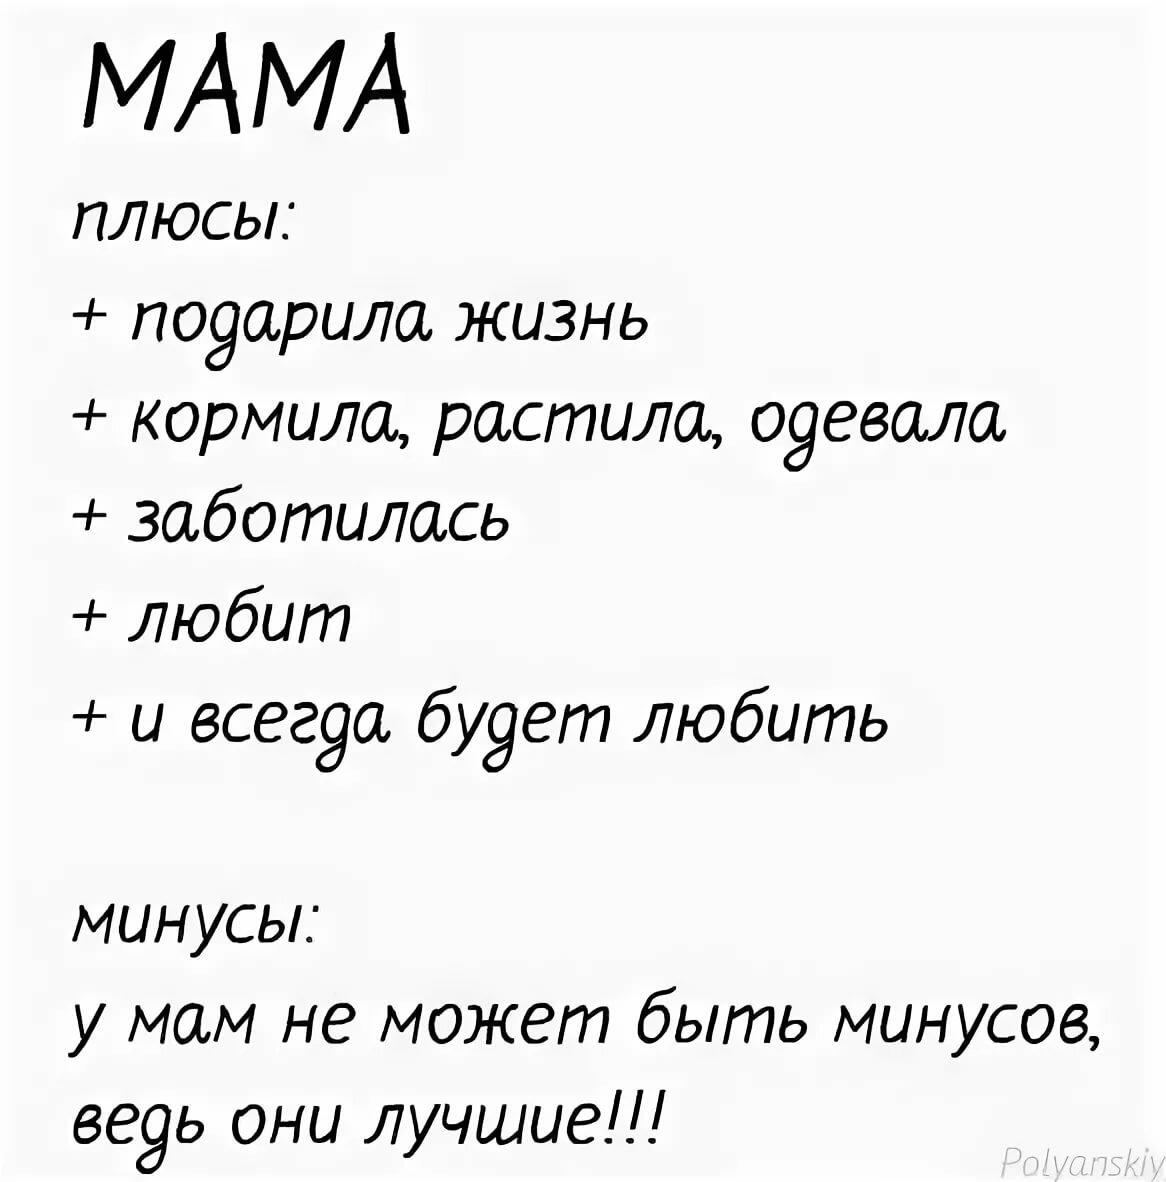 ближайшие картинки мама я тебя люблю со стихами фото